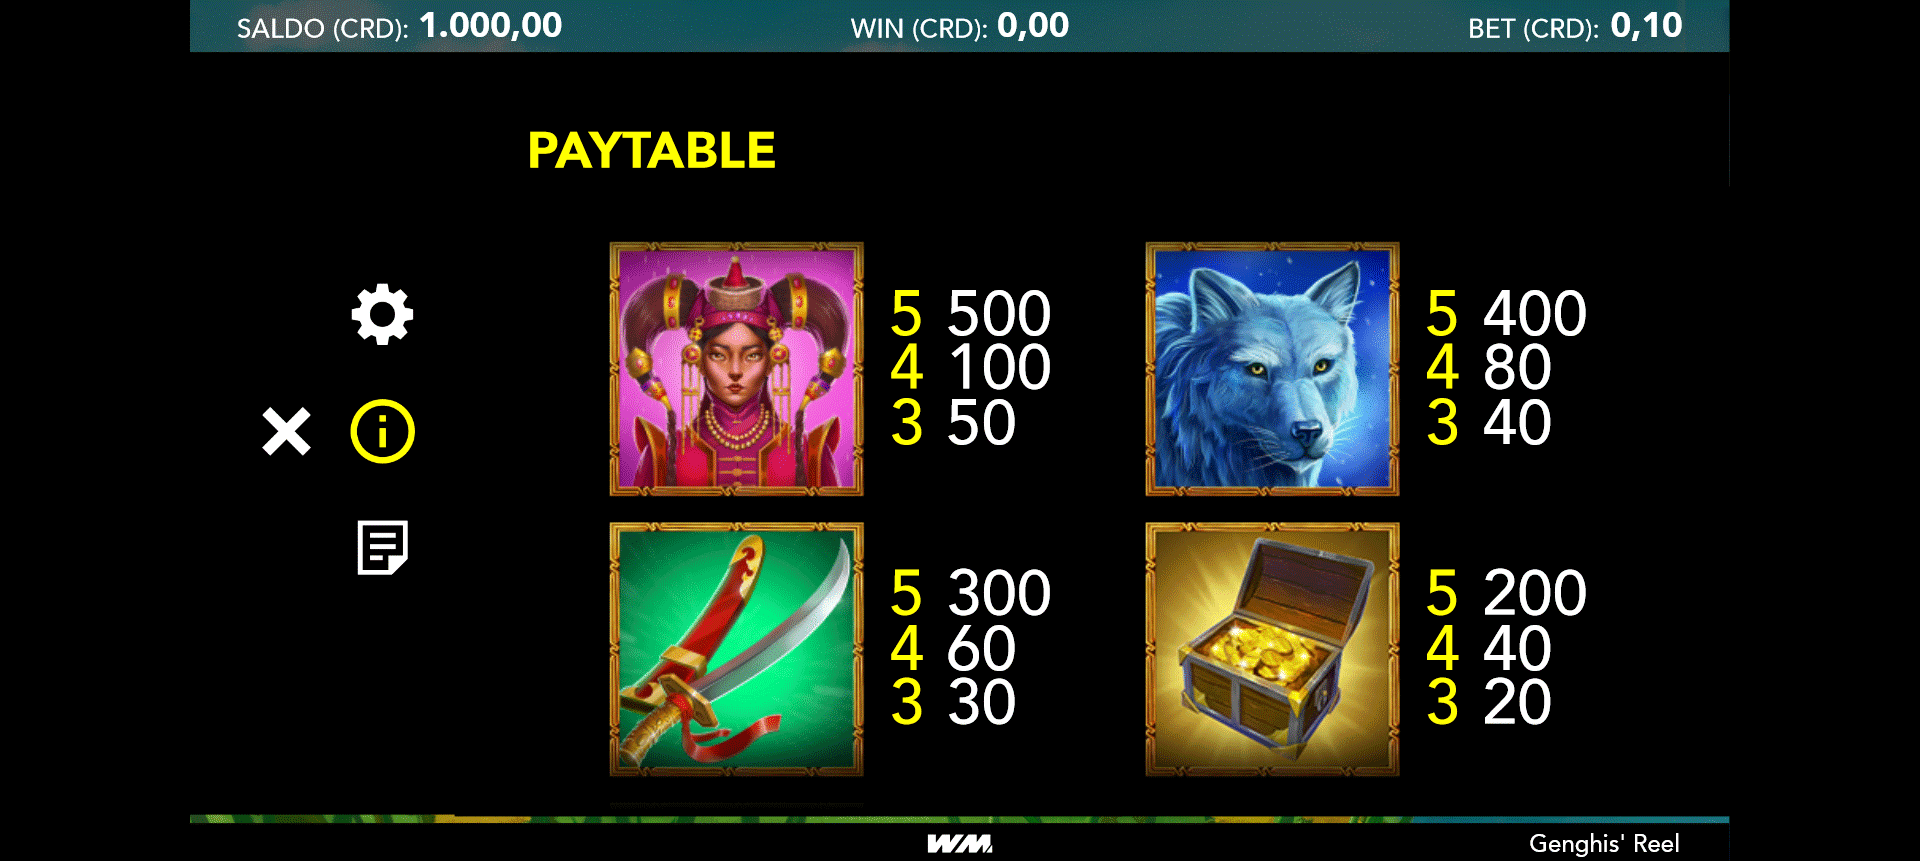 simboli del gioco slot machine genghi's reel